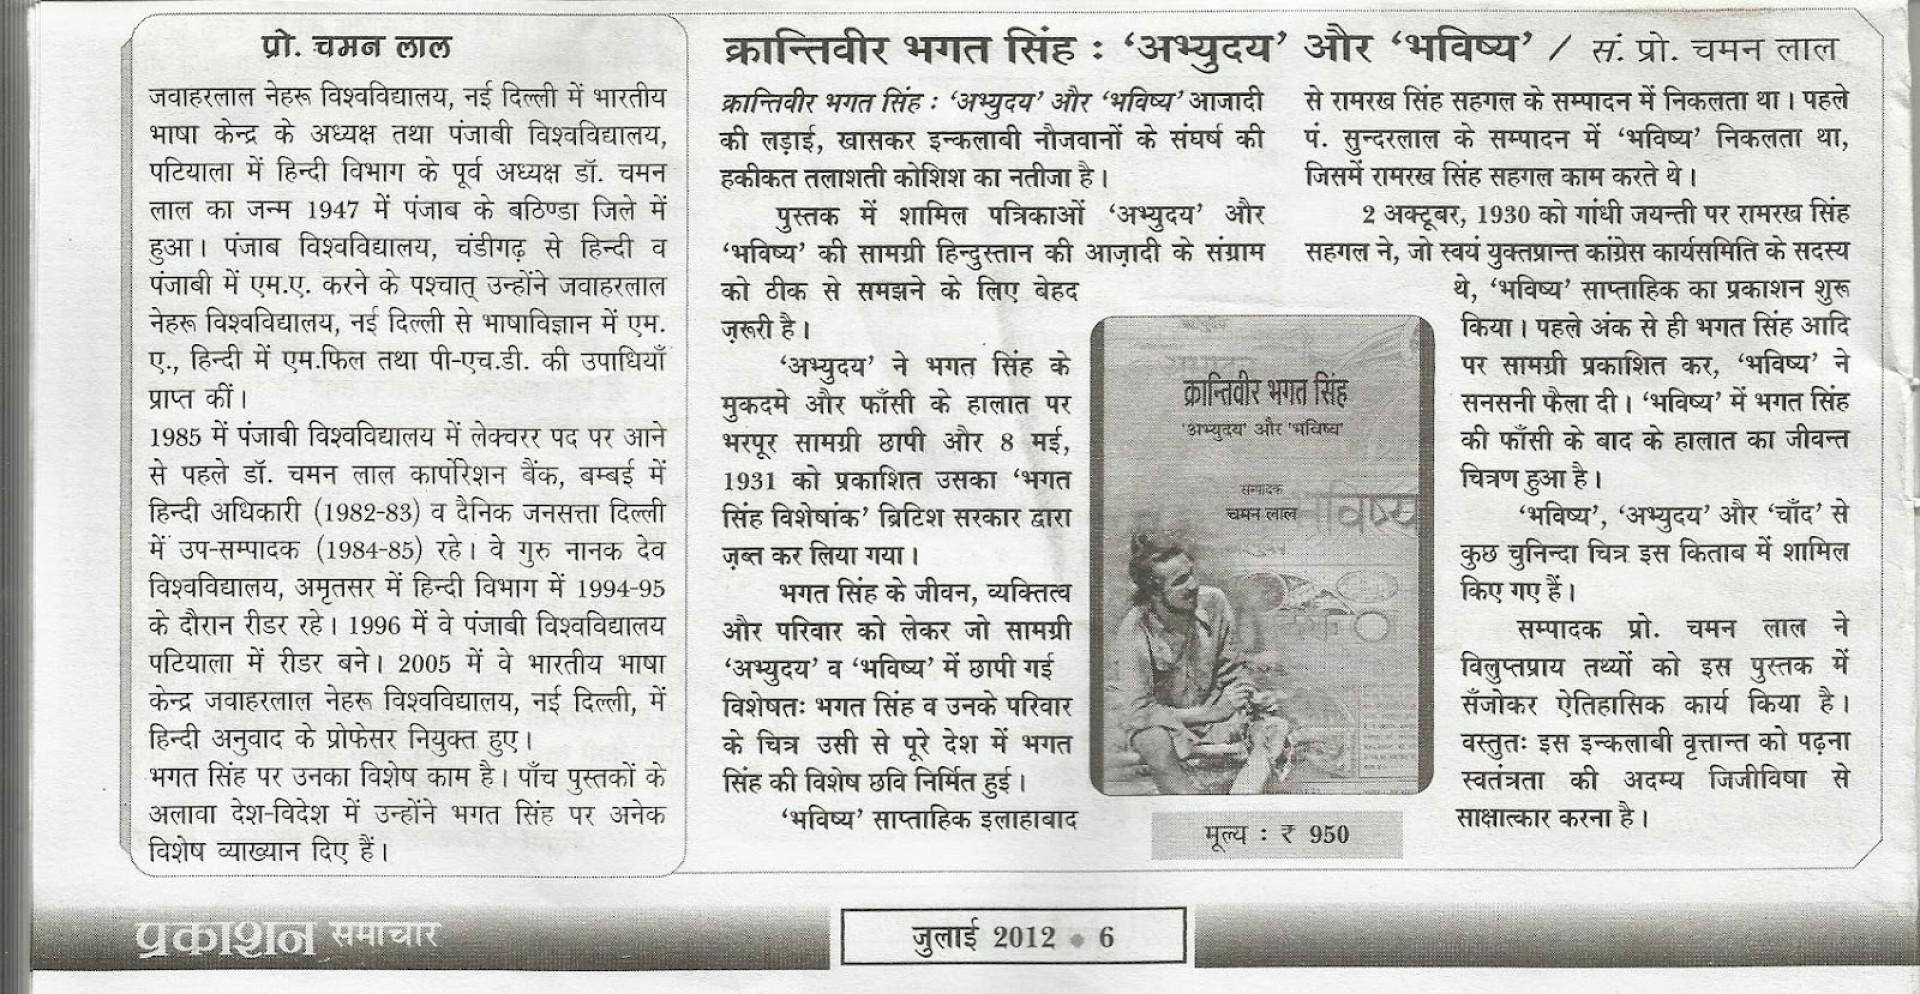 003 Essay On Bhagat Singh In Marathi Example Titleofnewbookonbhagatsinghinhindi Unique Short 100 Words 1920